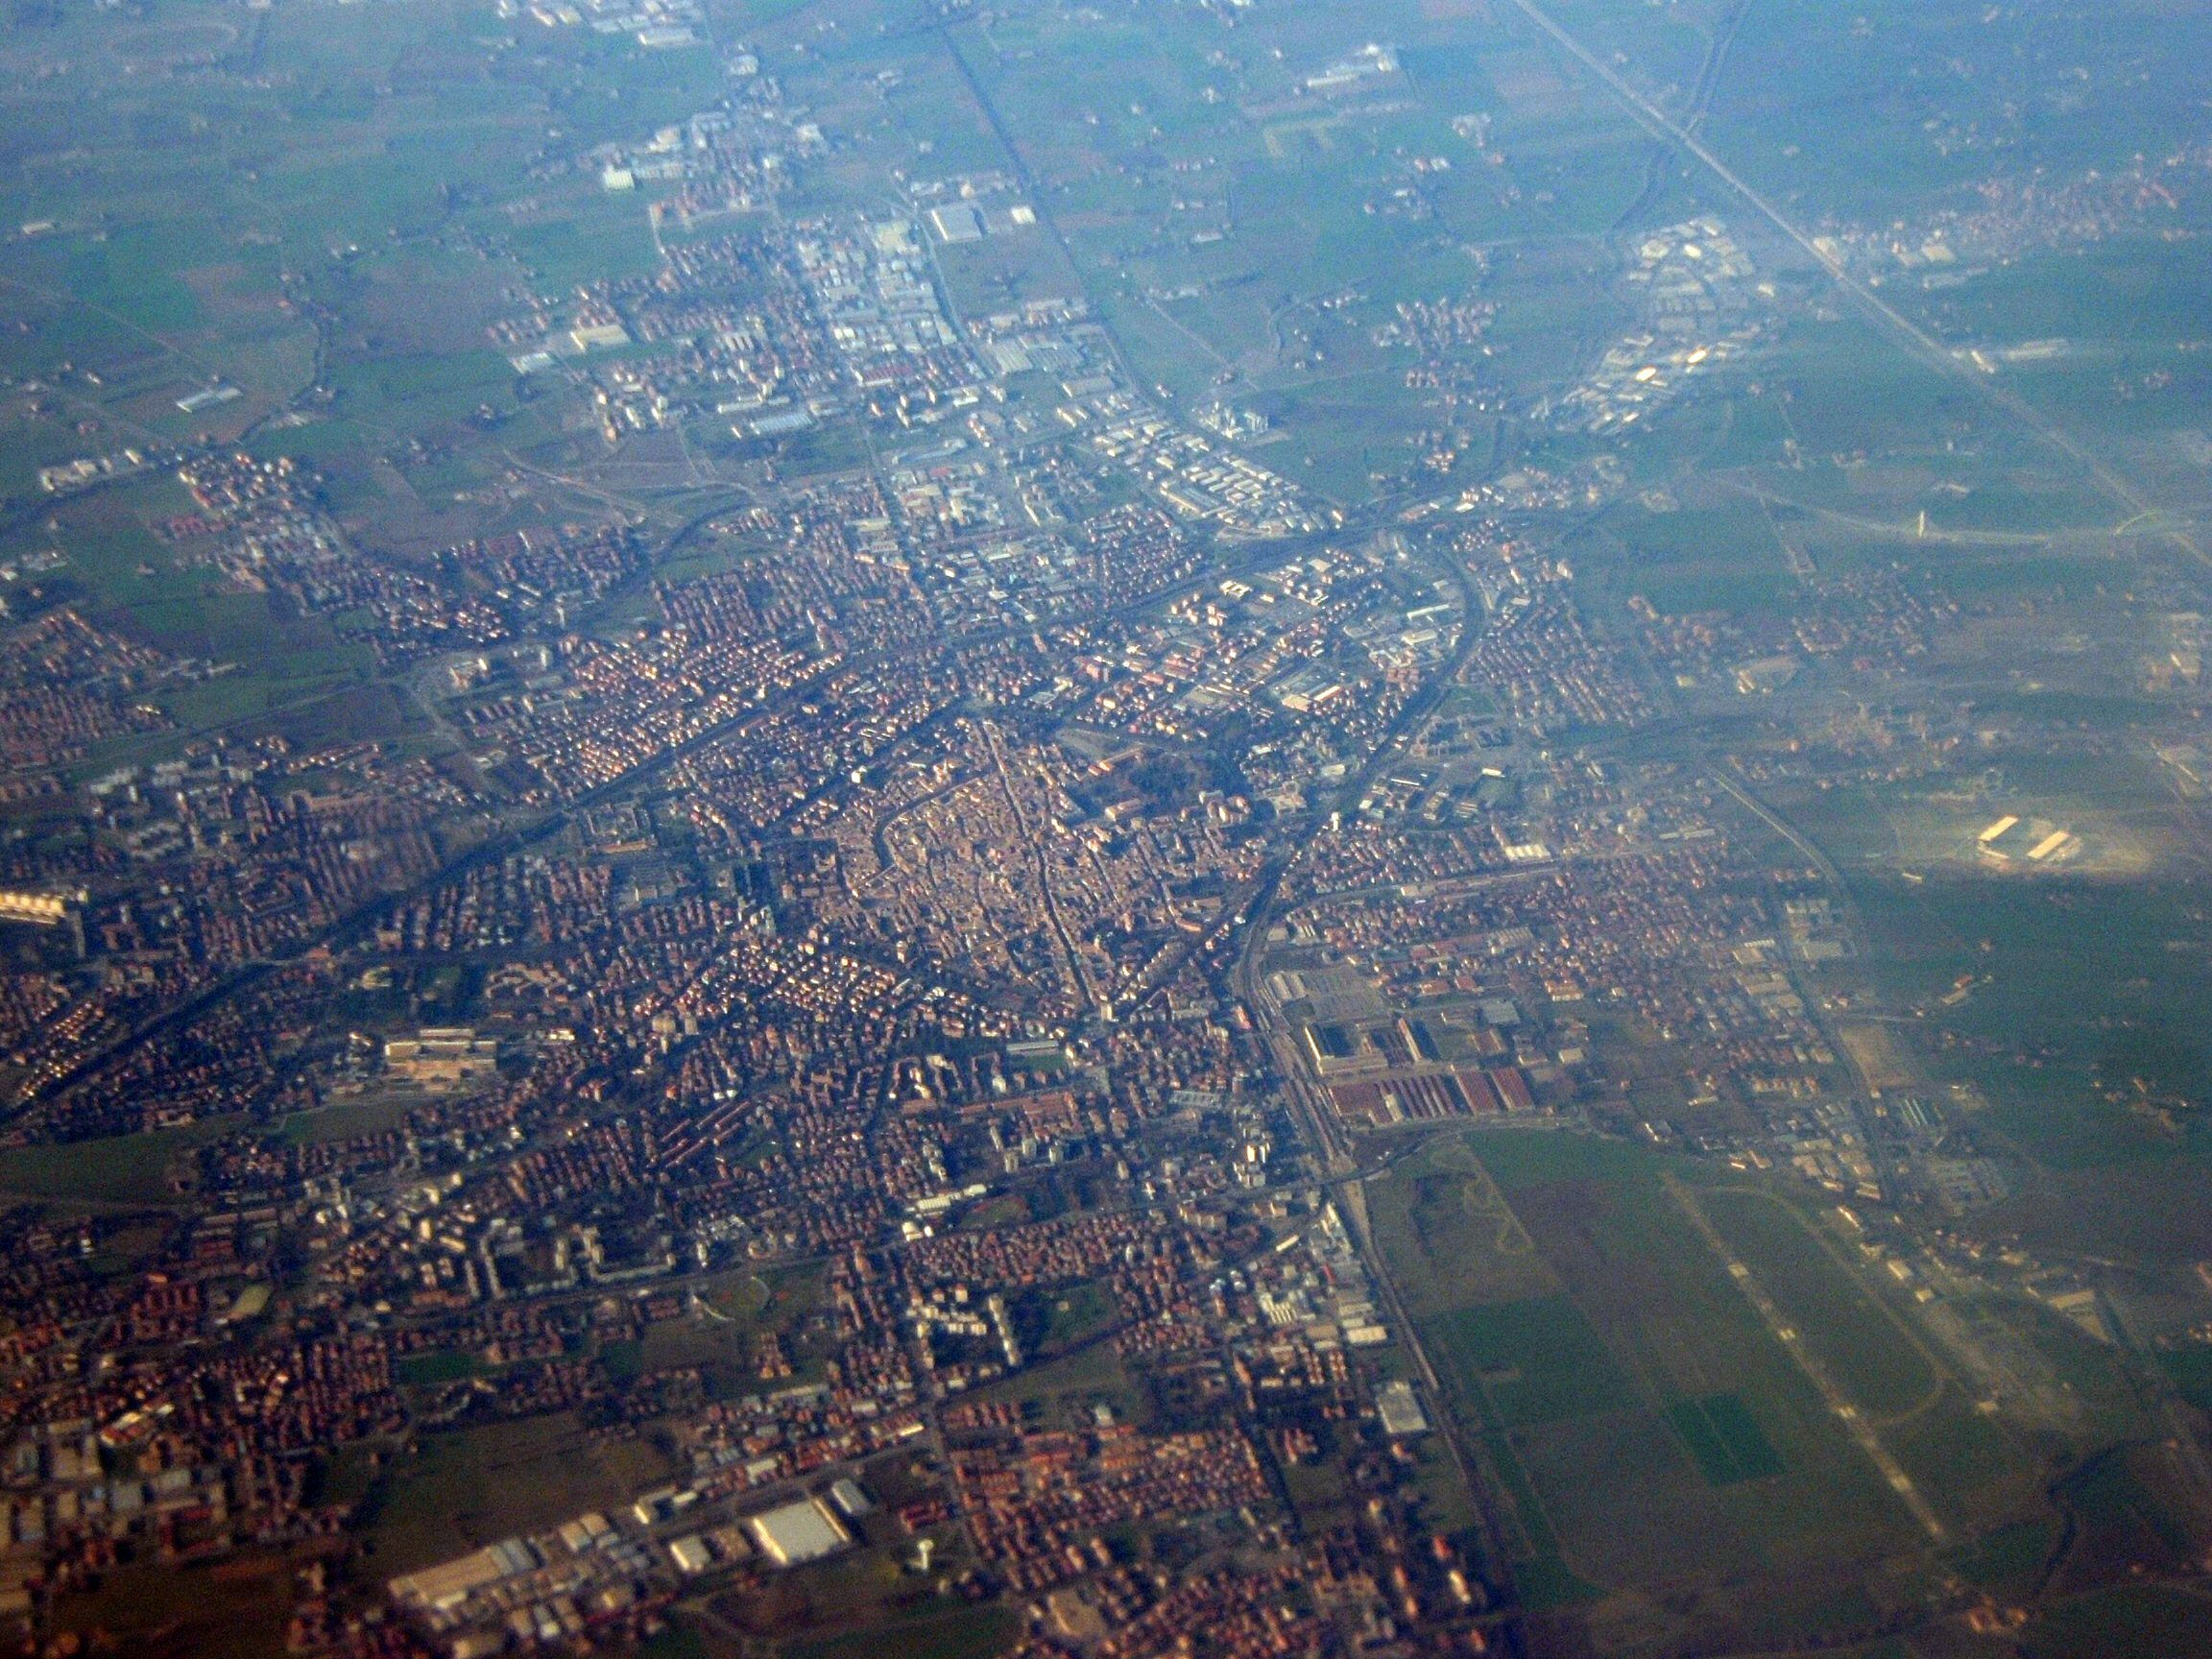 Reggio_nell'Emilia_aerial_Italy_view.jpg (2304×1728)